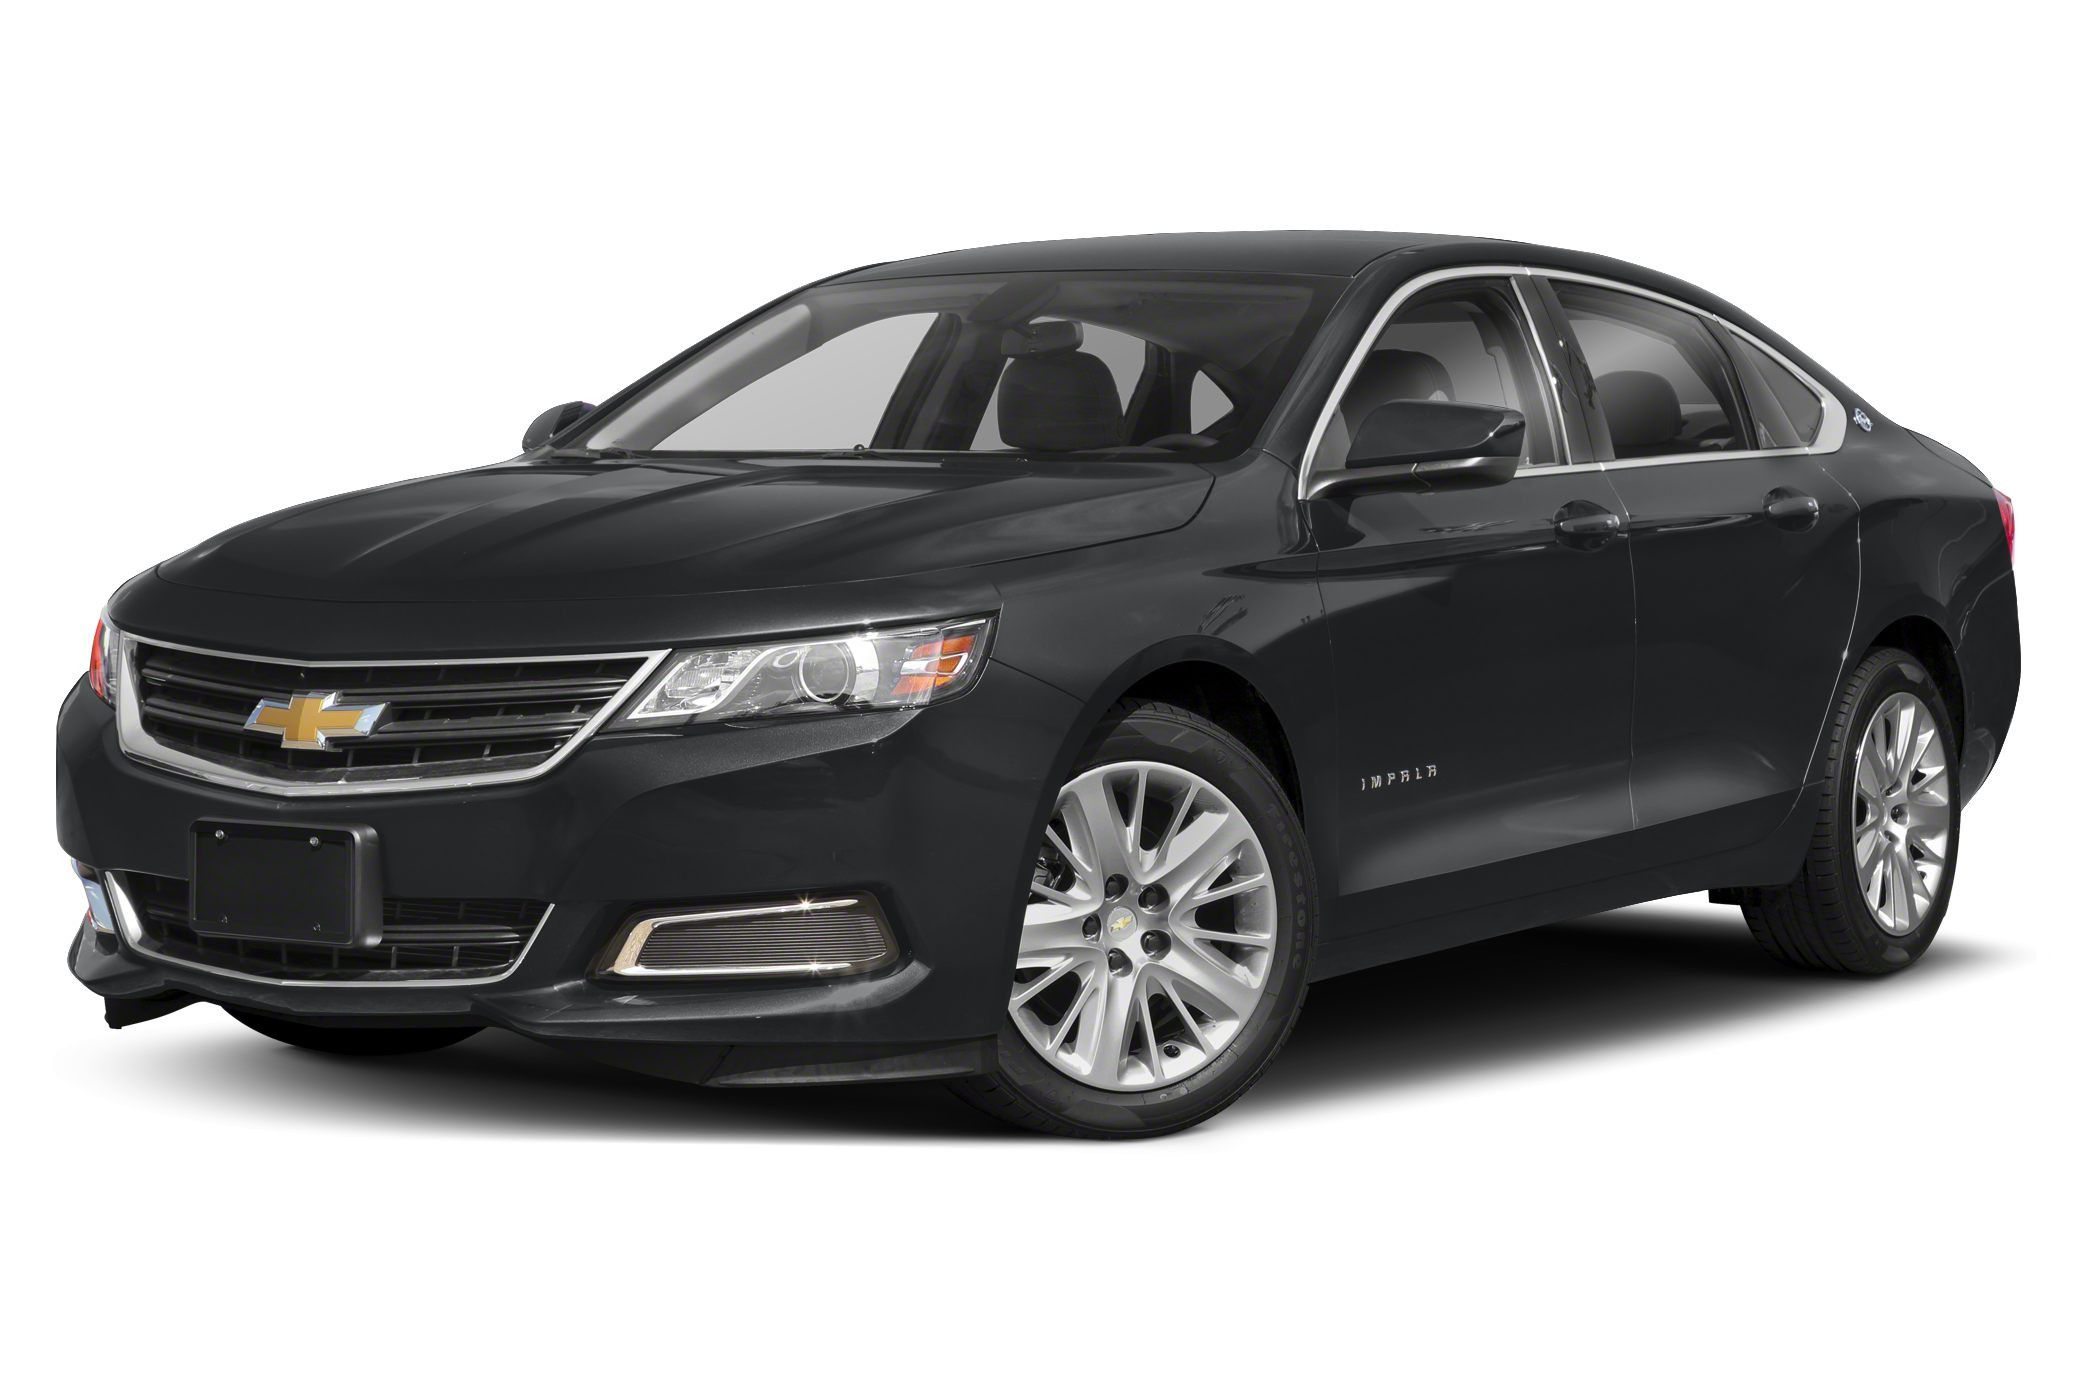 Pin On My Brand New Impala